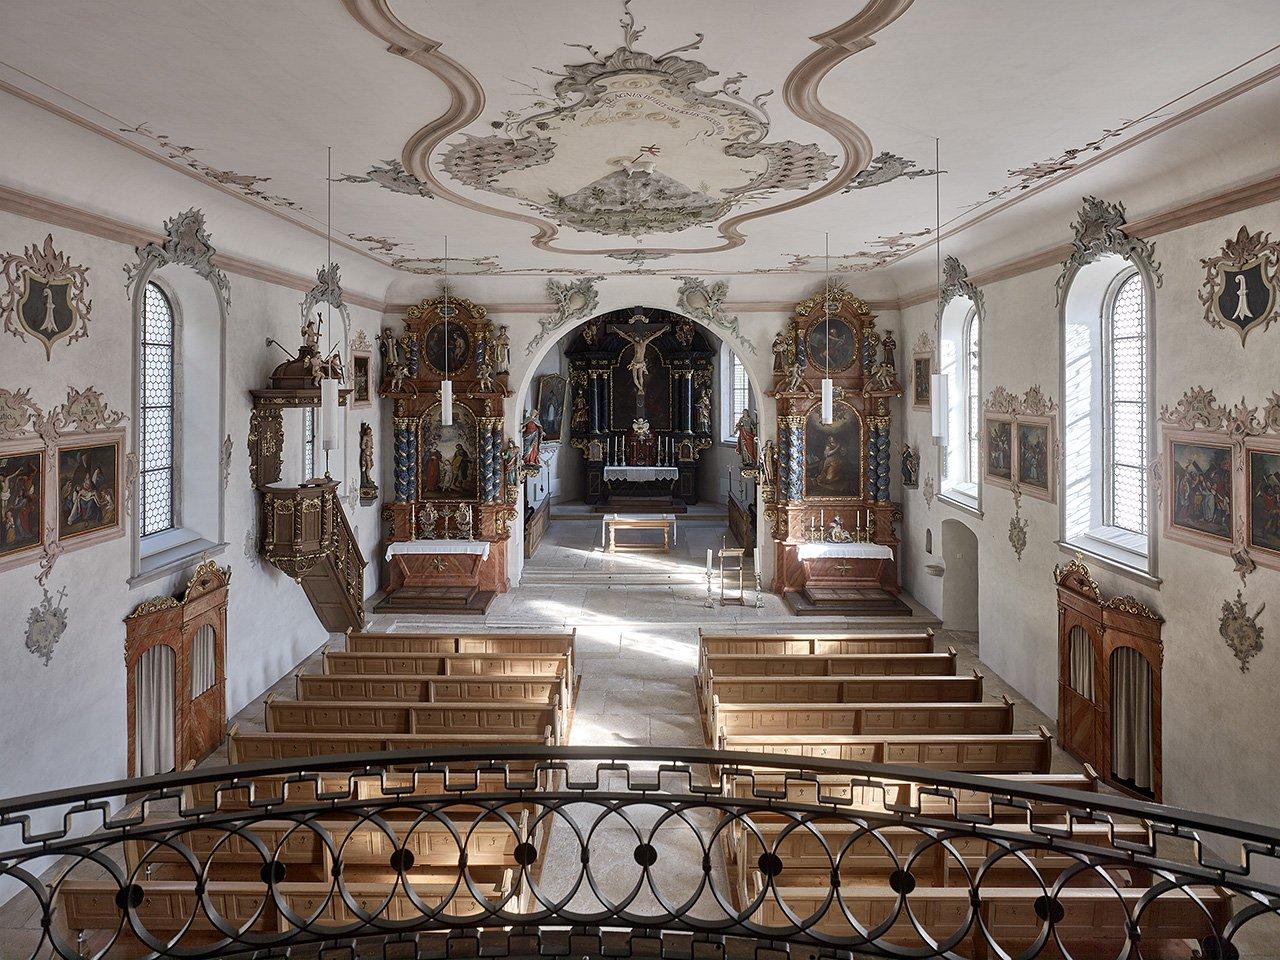 St. Katharinenkirche Laufen - Innenraum